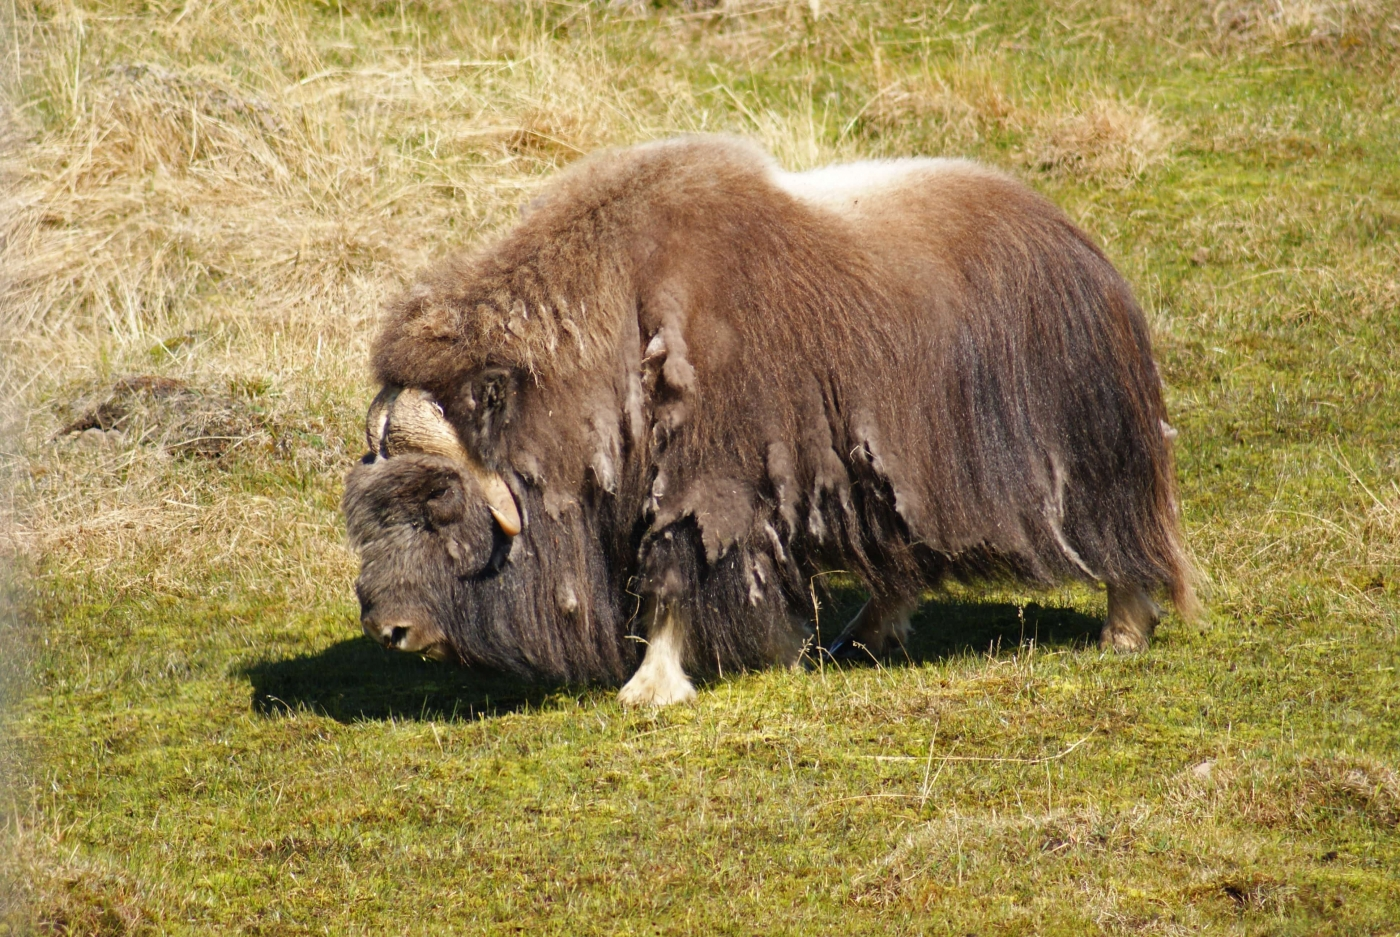 Muskox Bull on green meadow in Kangerlussuaq. Photo by Greenland Outdoors